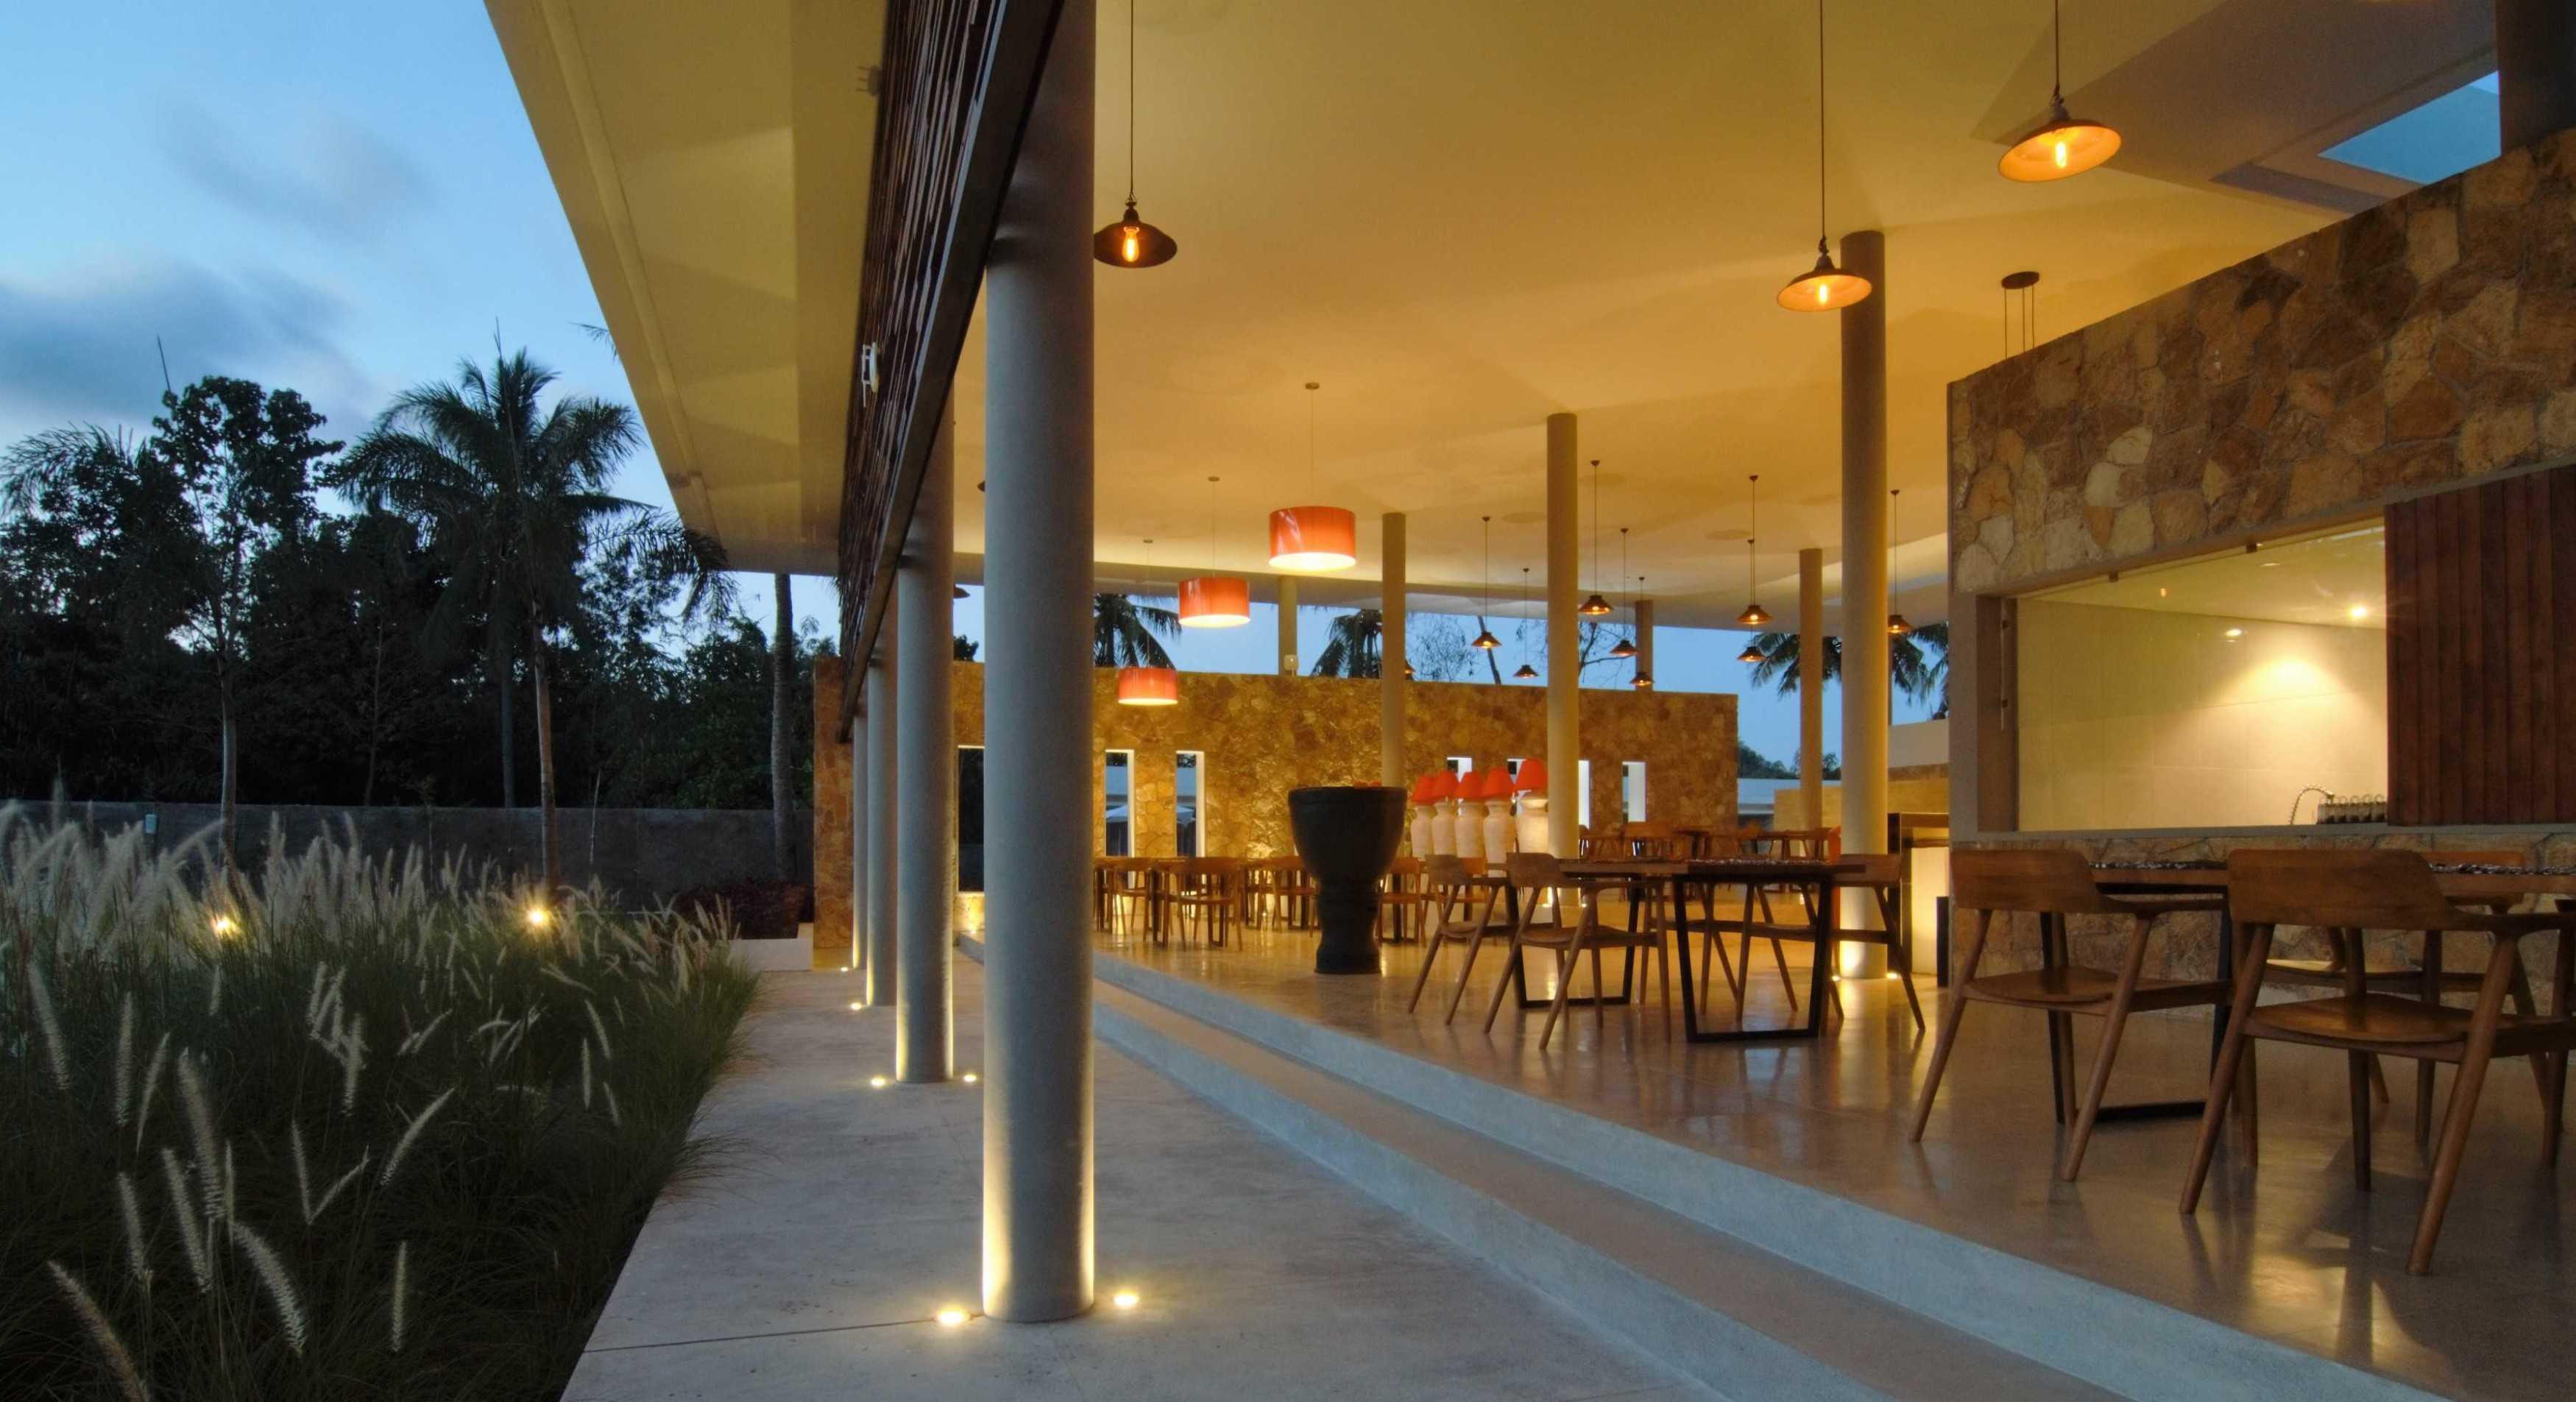 Beni Sabara Origin Resort - Lombok Kuta, Pujut, Kabupaten Lombok Tengah, Nusa Tenggara Bar., Indonesia Kuta, Pujut, Kabupaten Lombok Tengah, Nusa Tenggara Bar., Indonesia Beni-Sabara-Origin-Resort-Lombok   60505